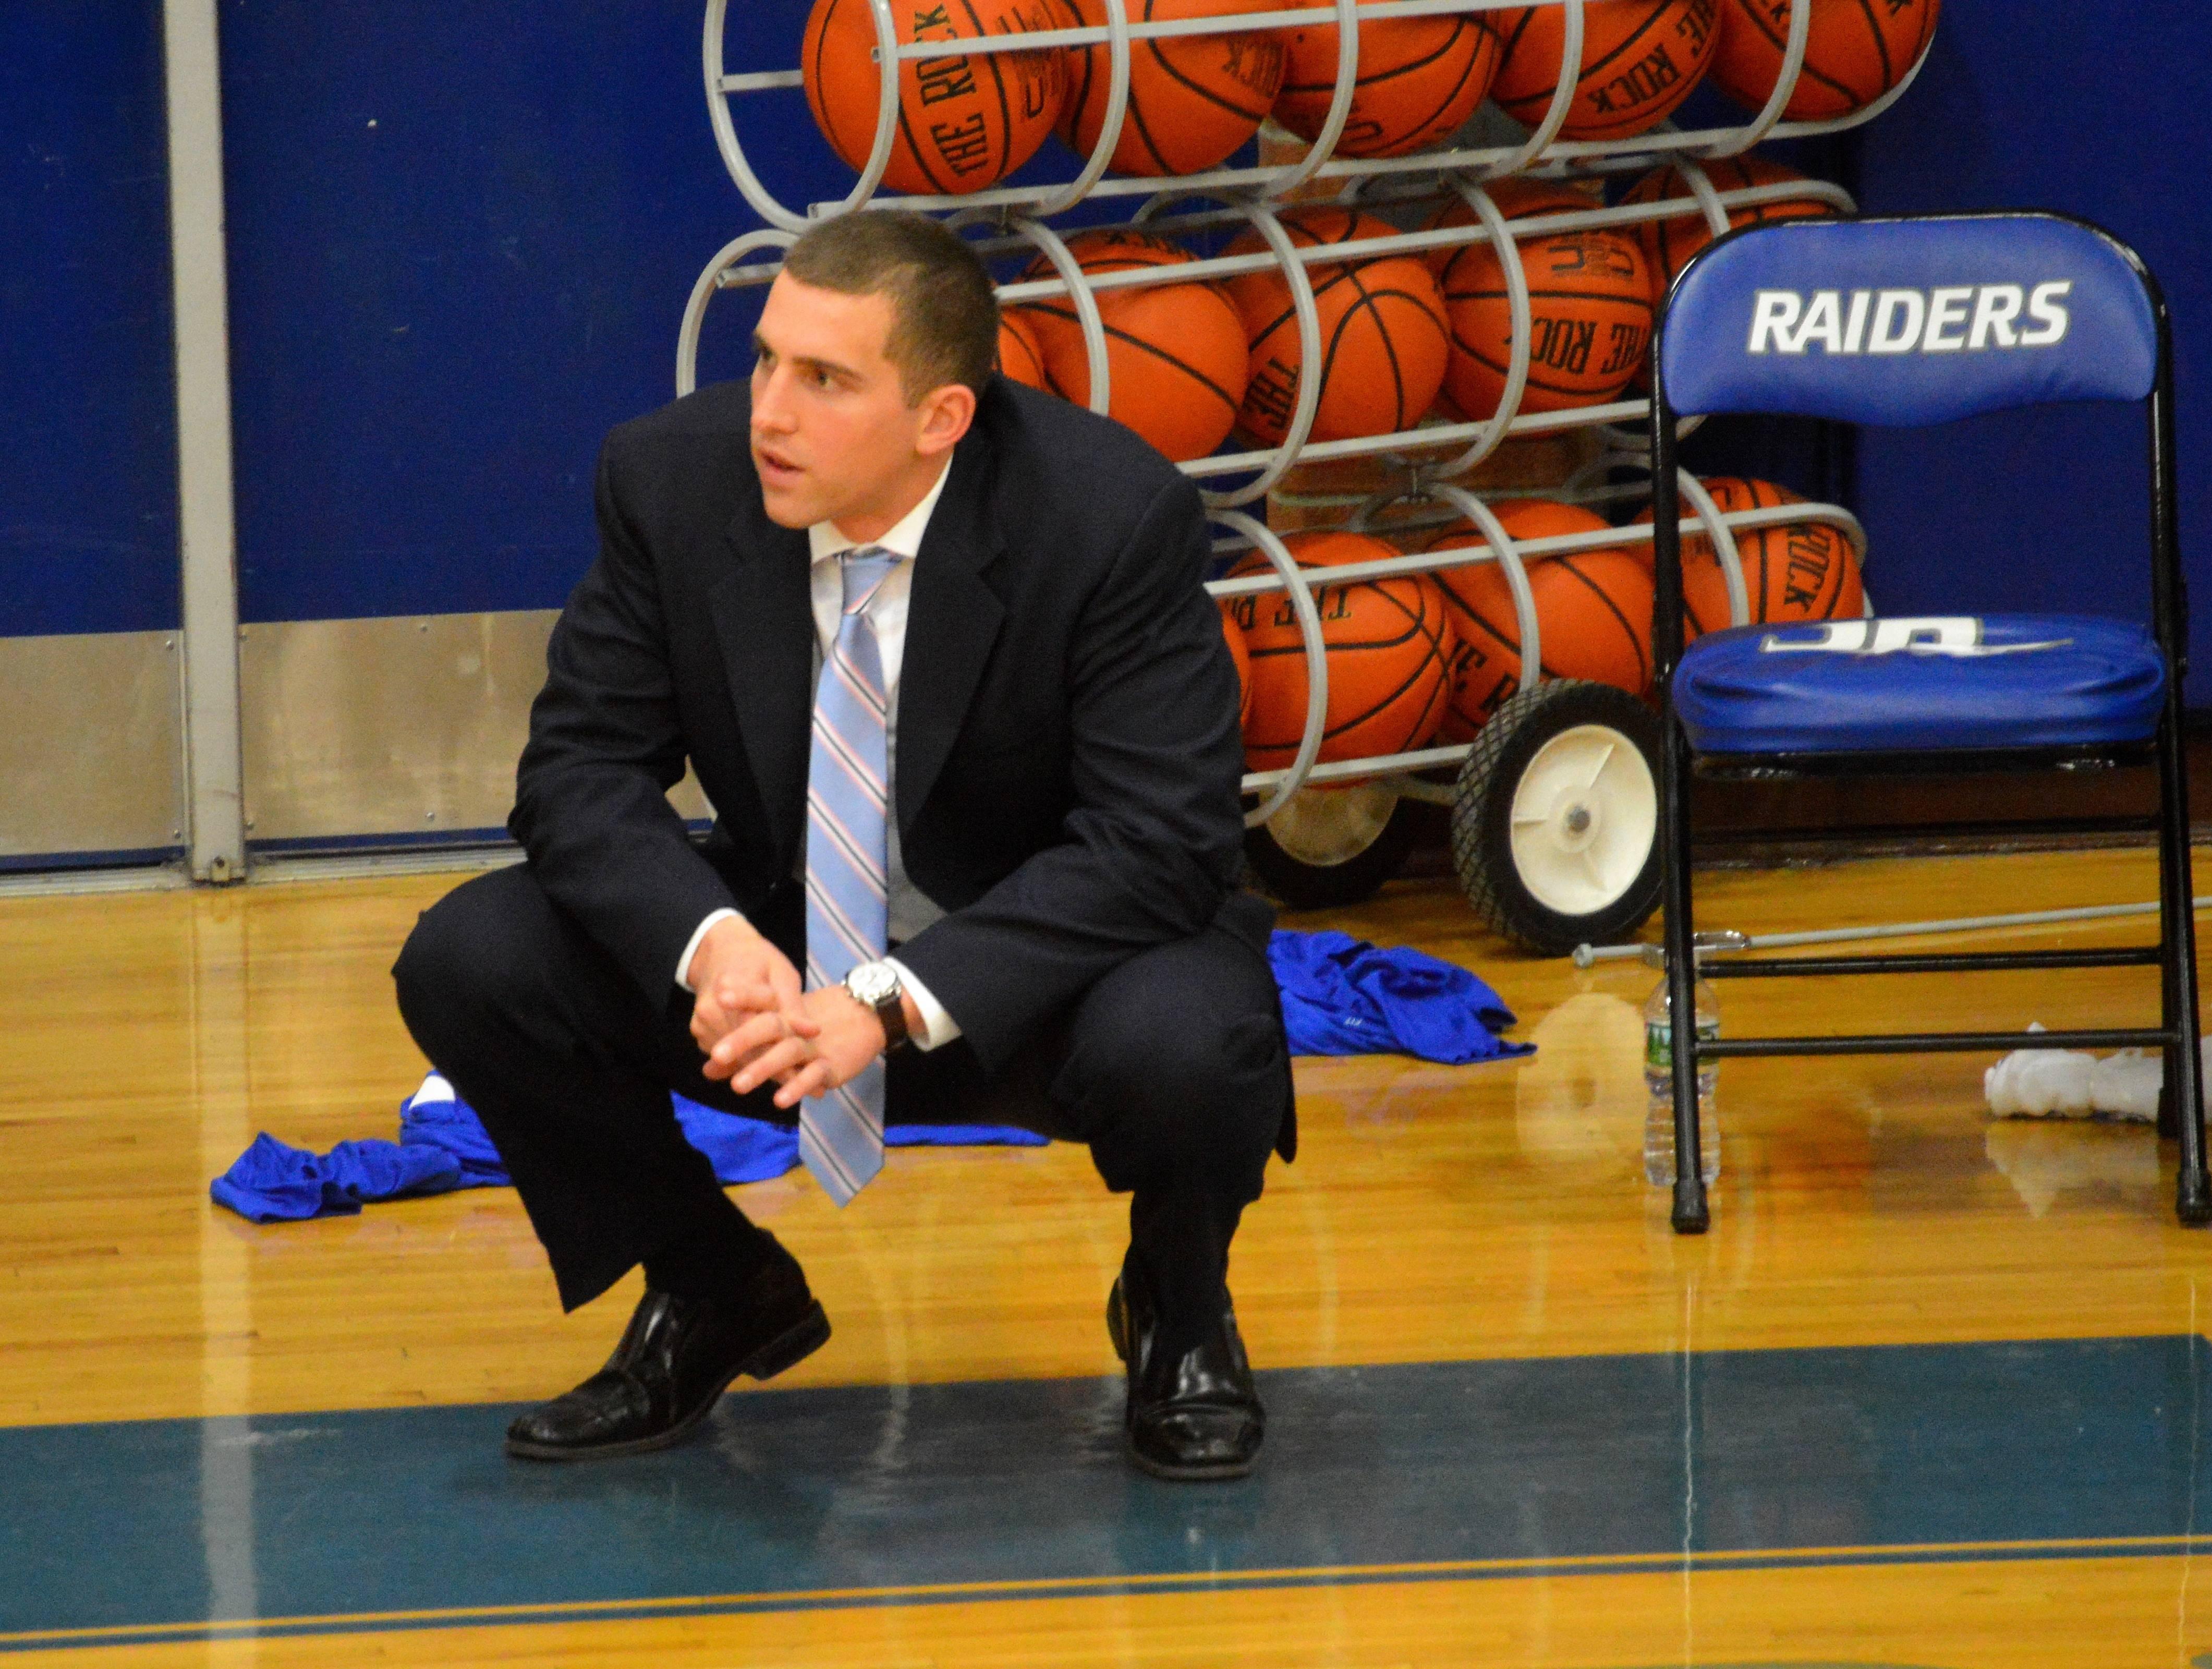 1bda45464ed1d9cccb54_SPFHS_basketball_head_coach_Steve_Siracusa.JPG